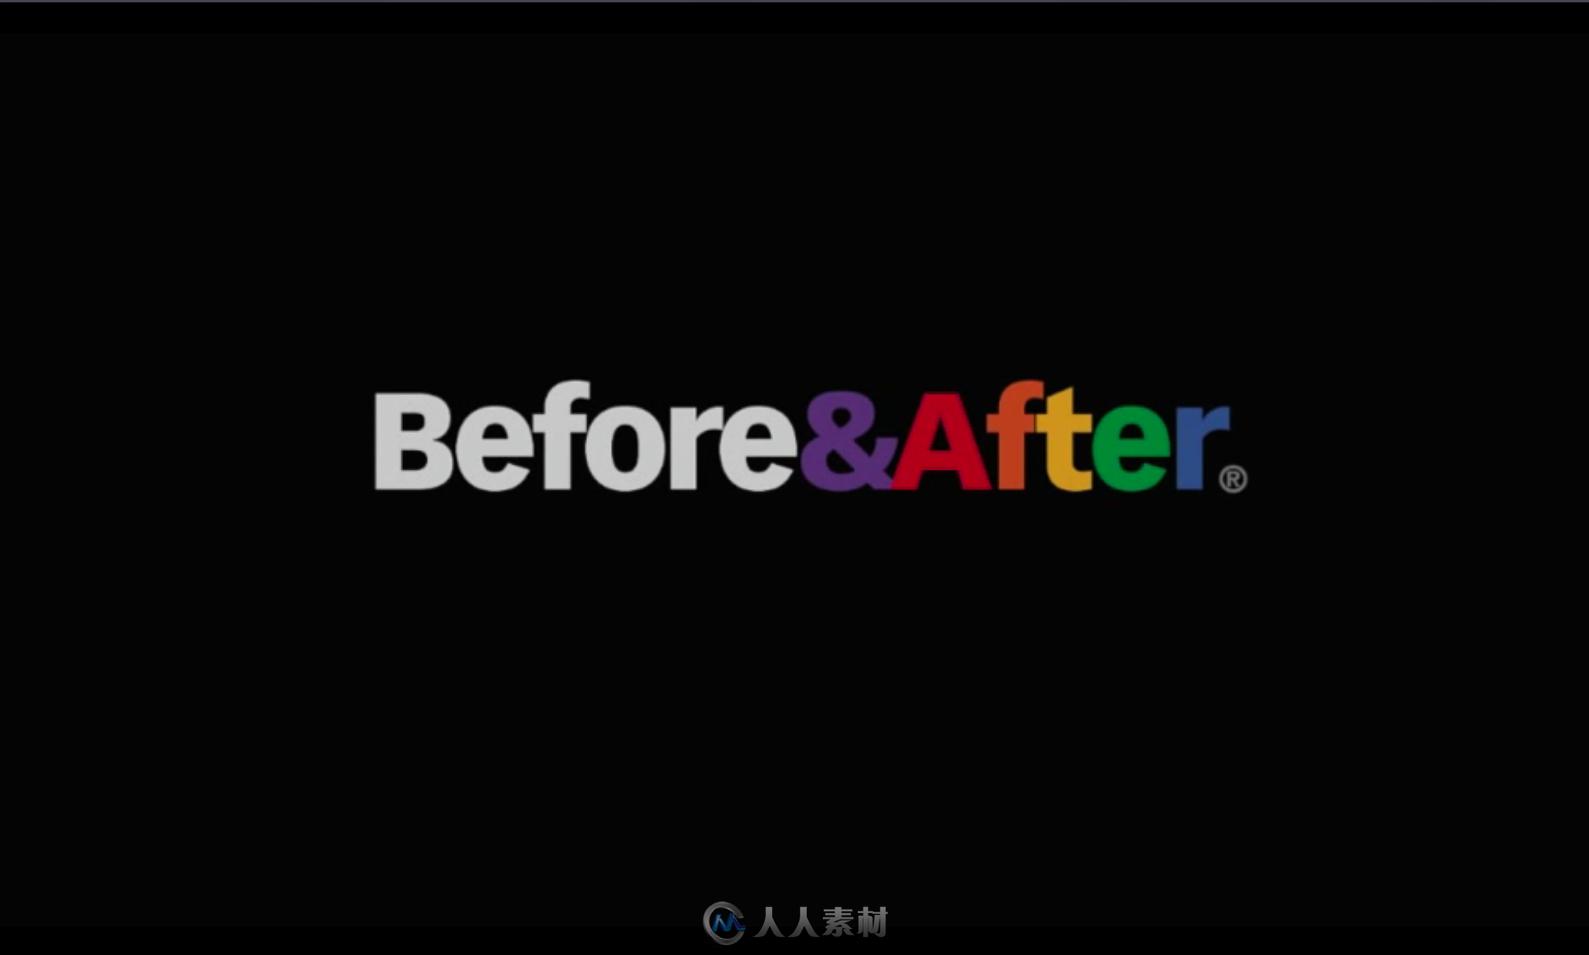 before&after 平面版式设计一二季全套视频教程